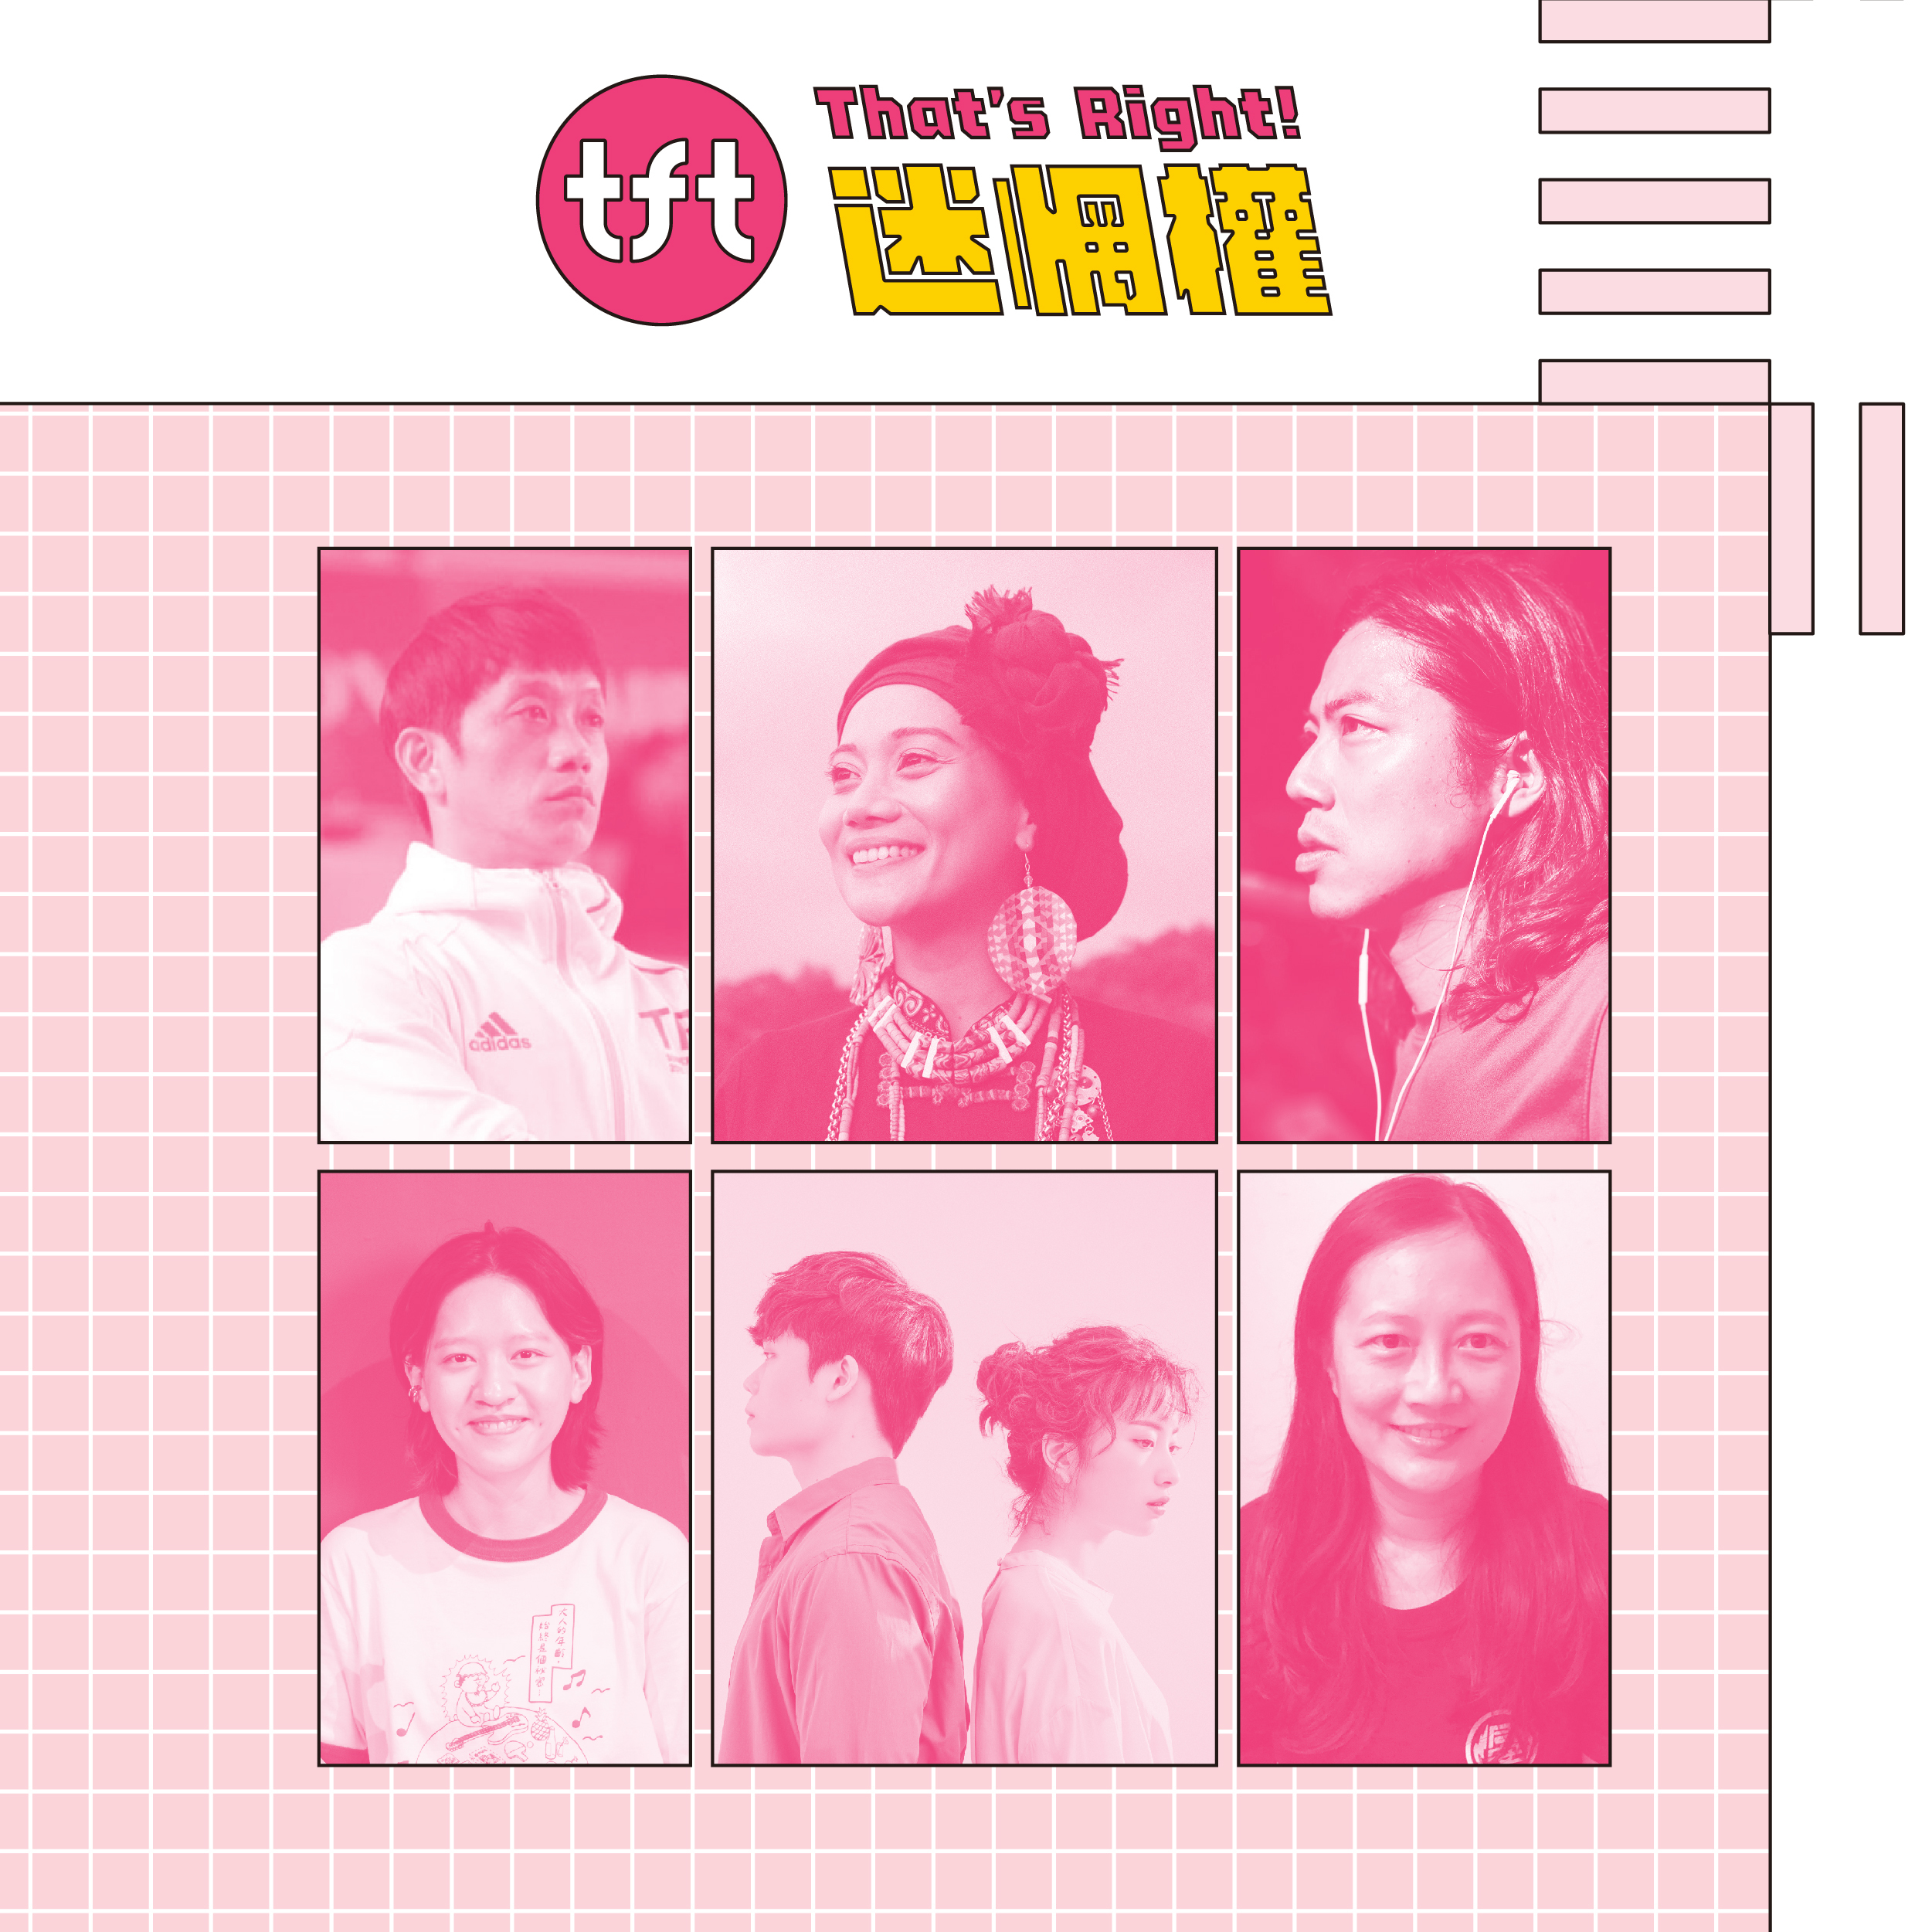 【 That's Right 迷惘權 】#3 追求理想沒錯,怎麼看待不完美的自己?(ft.南西肯恩/音樂人)